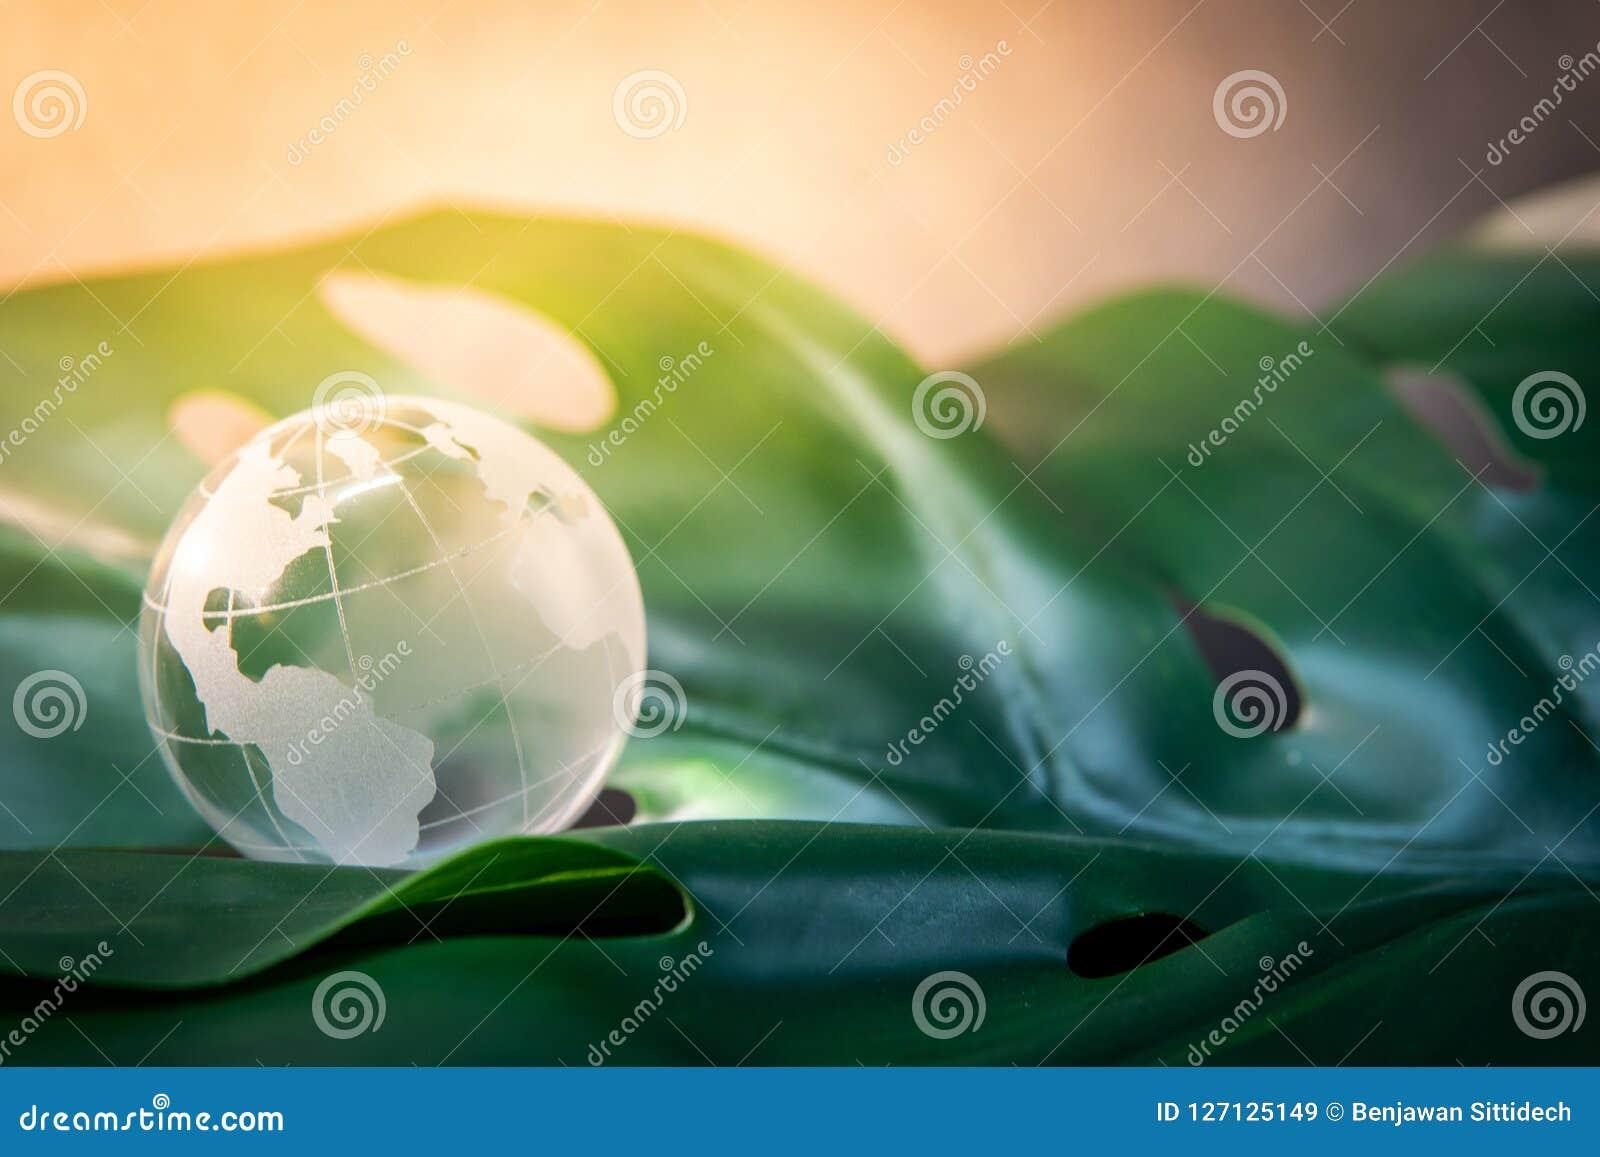 World globe cystal glass on green leaf